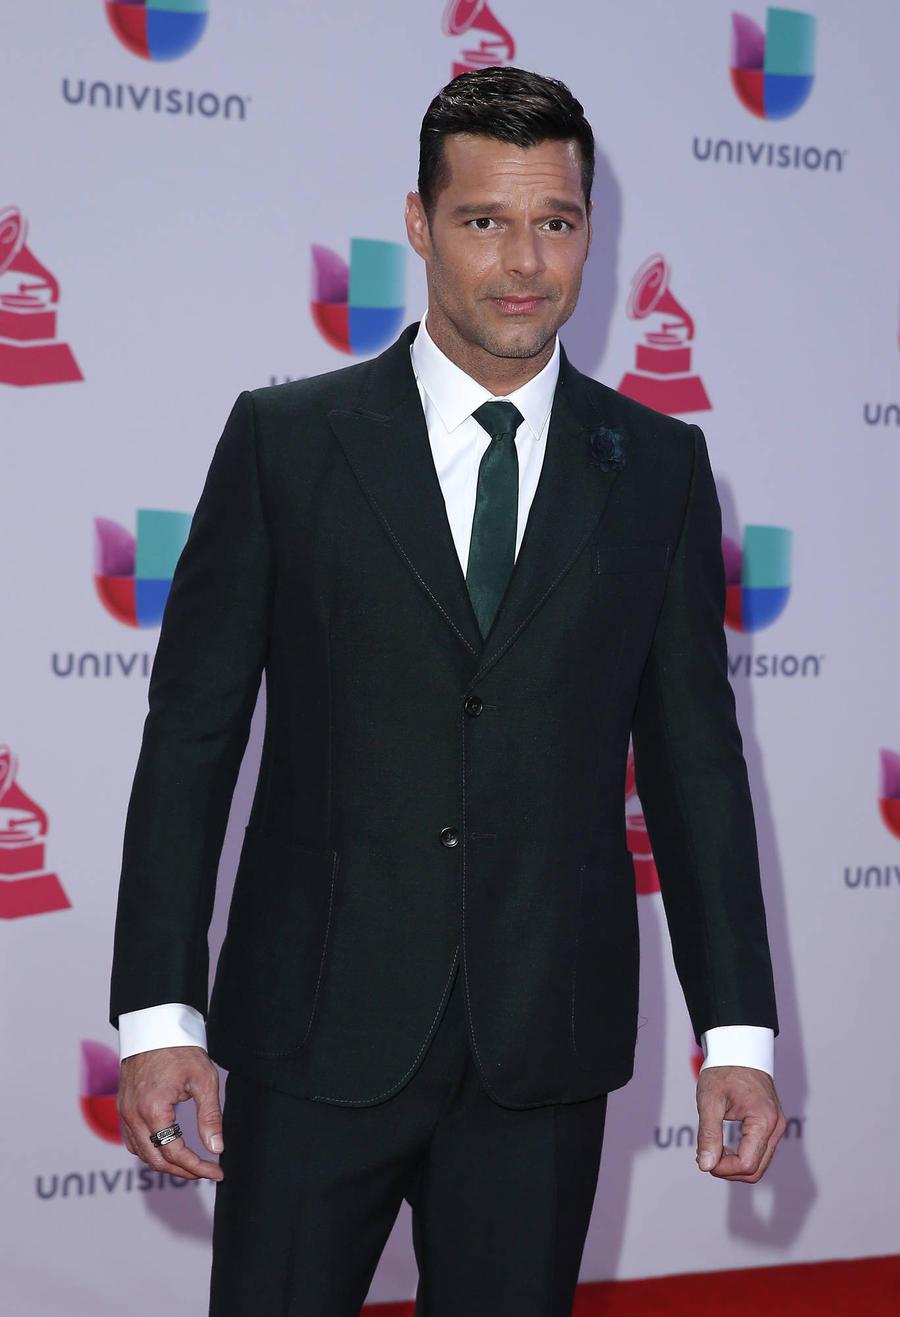 Ricky Martin Delays Mexico Concert